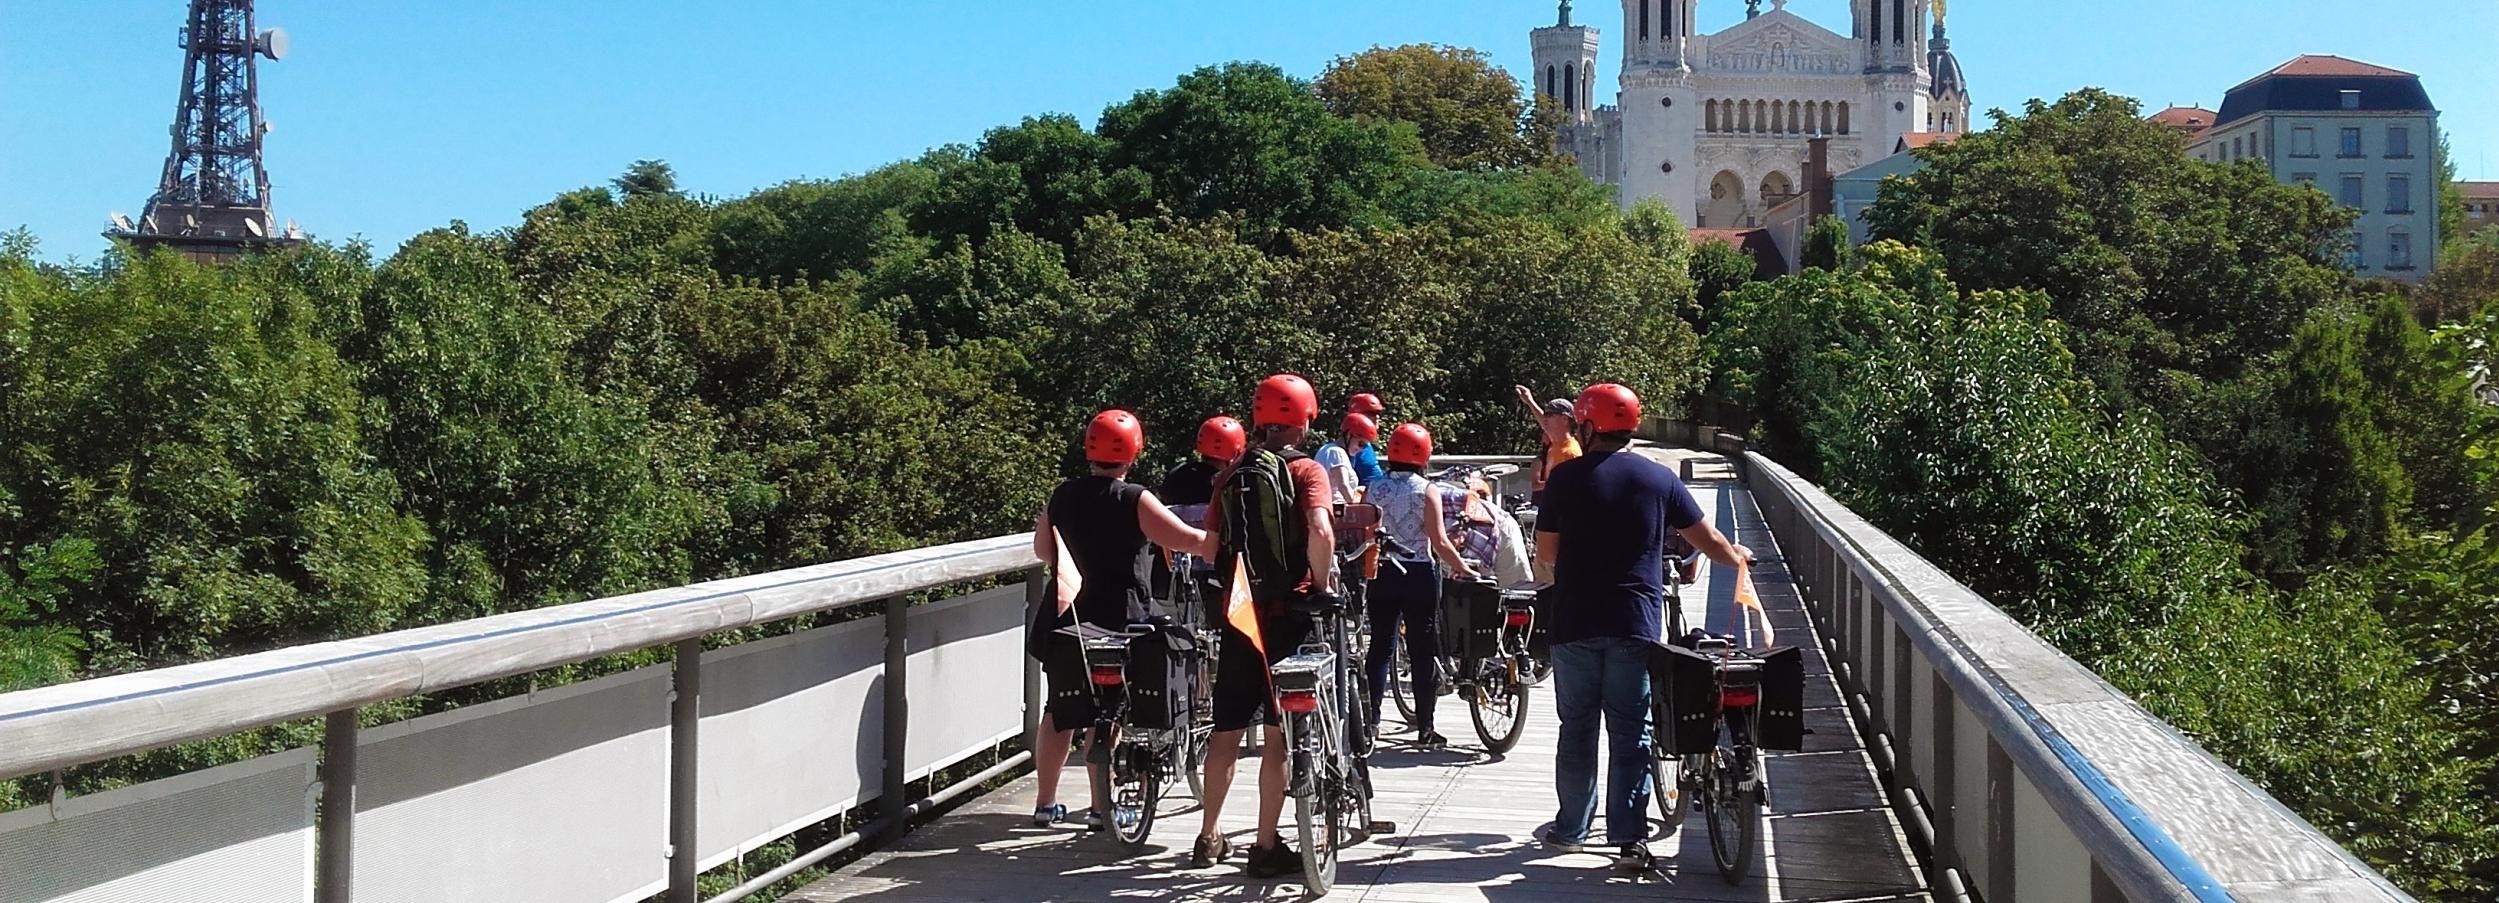 Lyon: 4-Hour Electric Bike Tour with Tasting Break